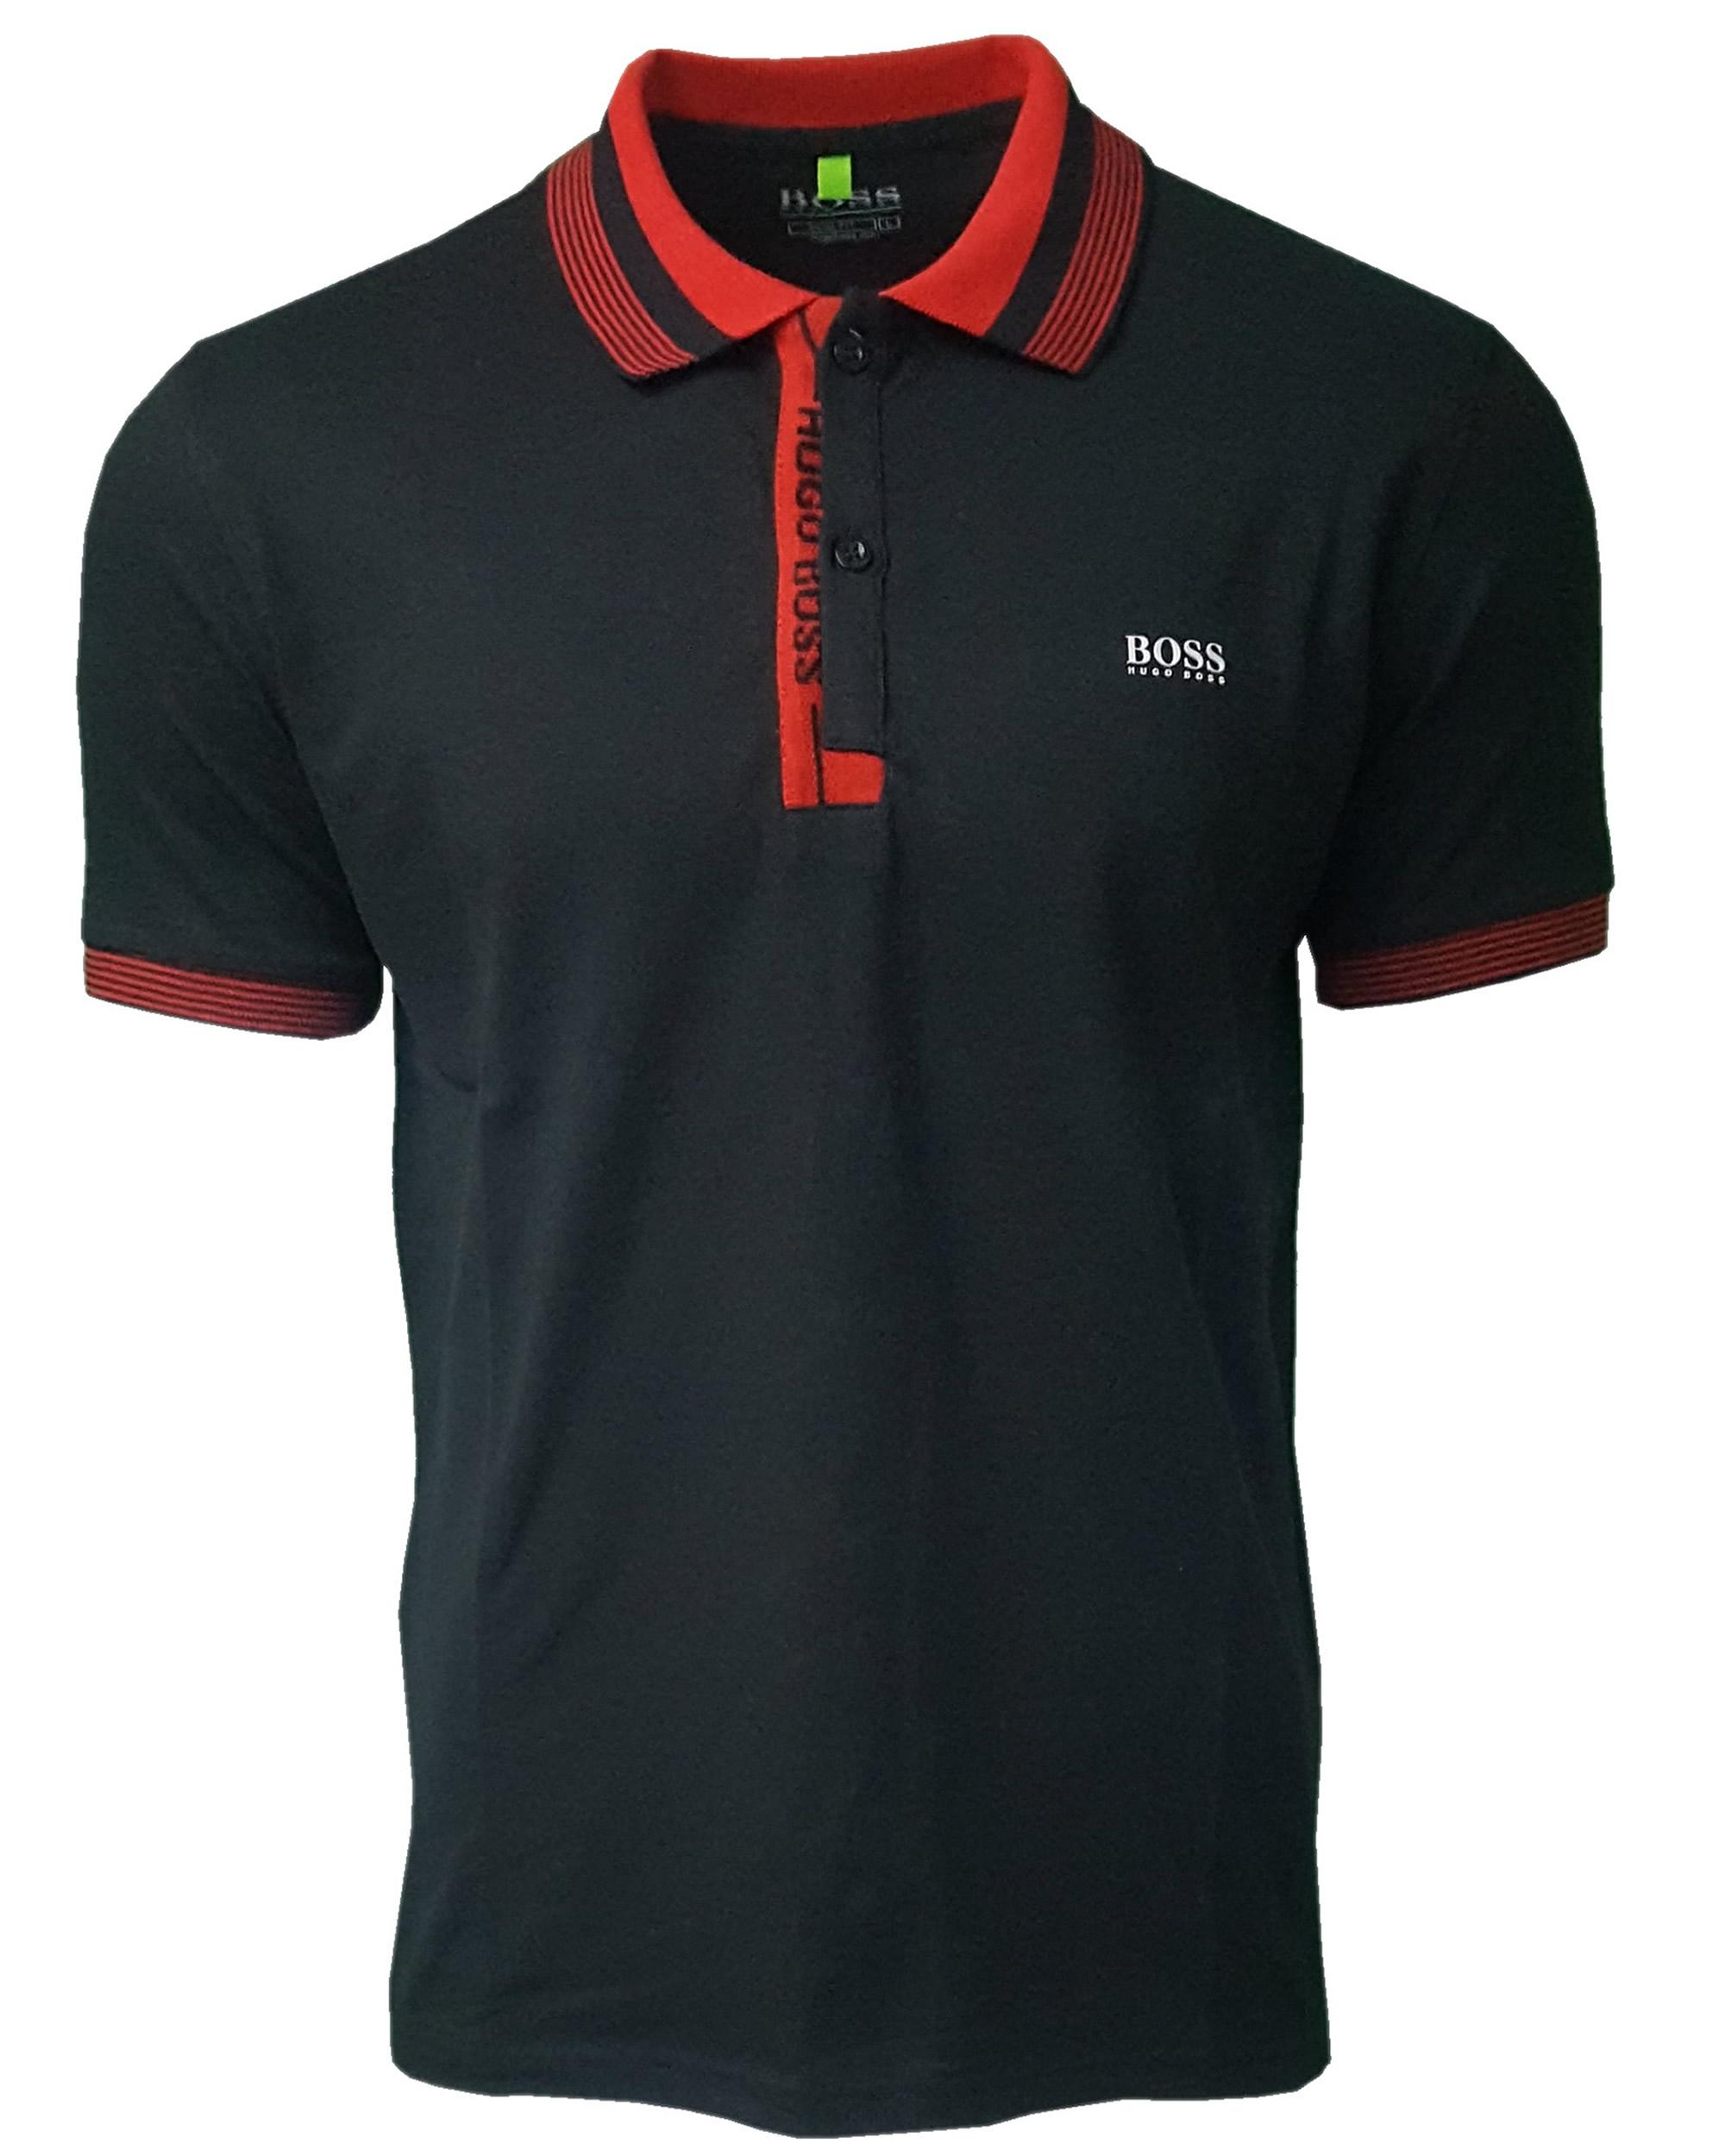 3db1b1330 Hugo Boss Paule Polo Shirt. Short Sleeve in Black